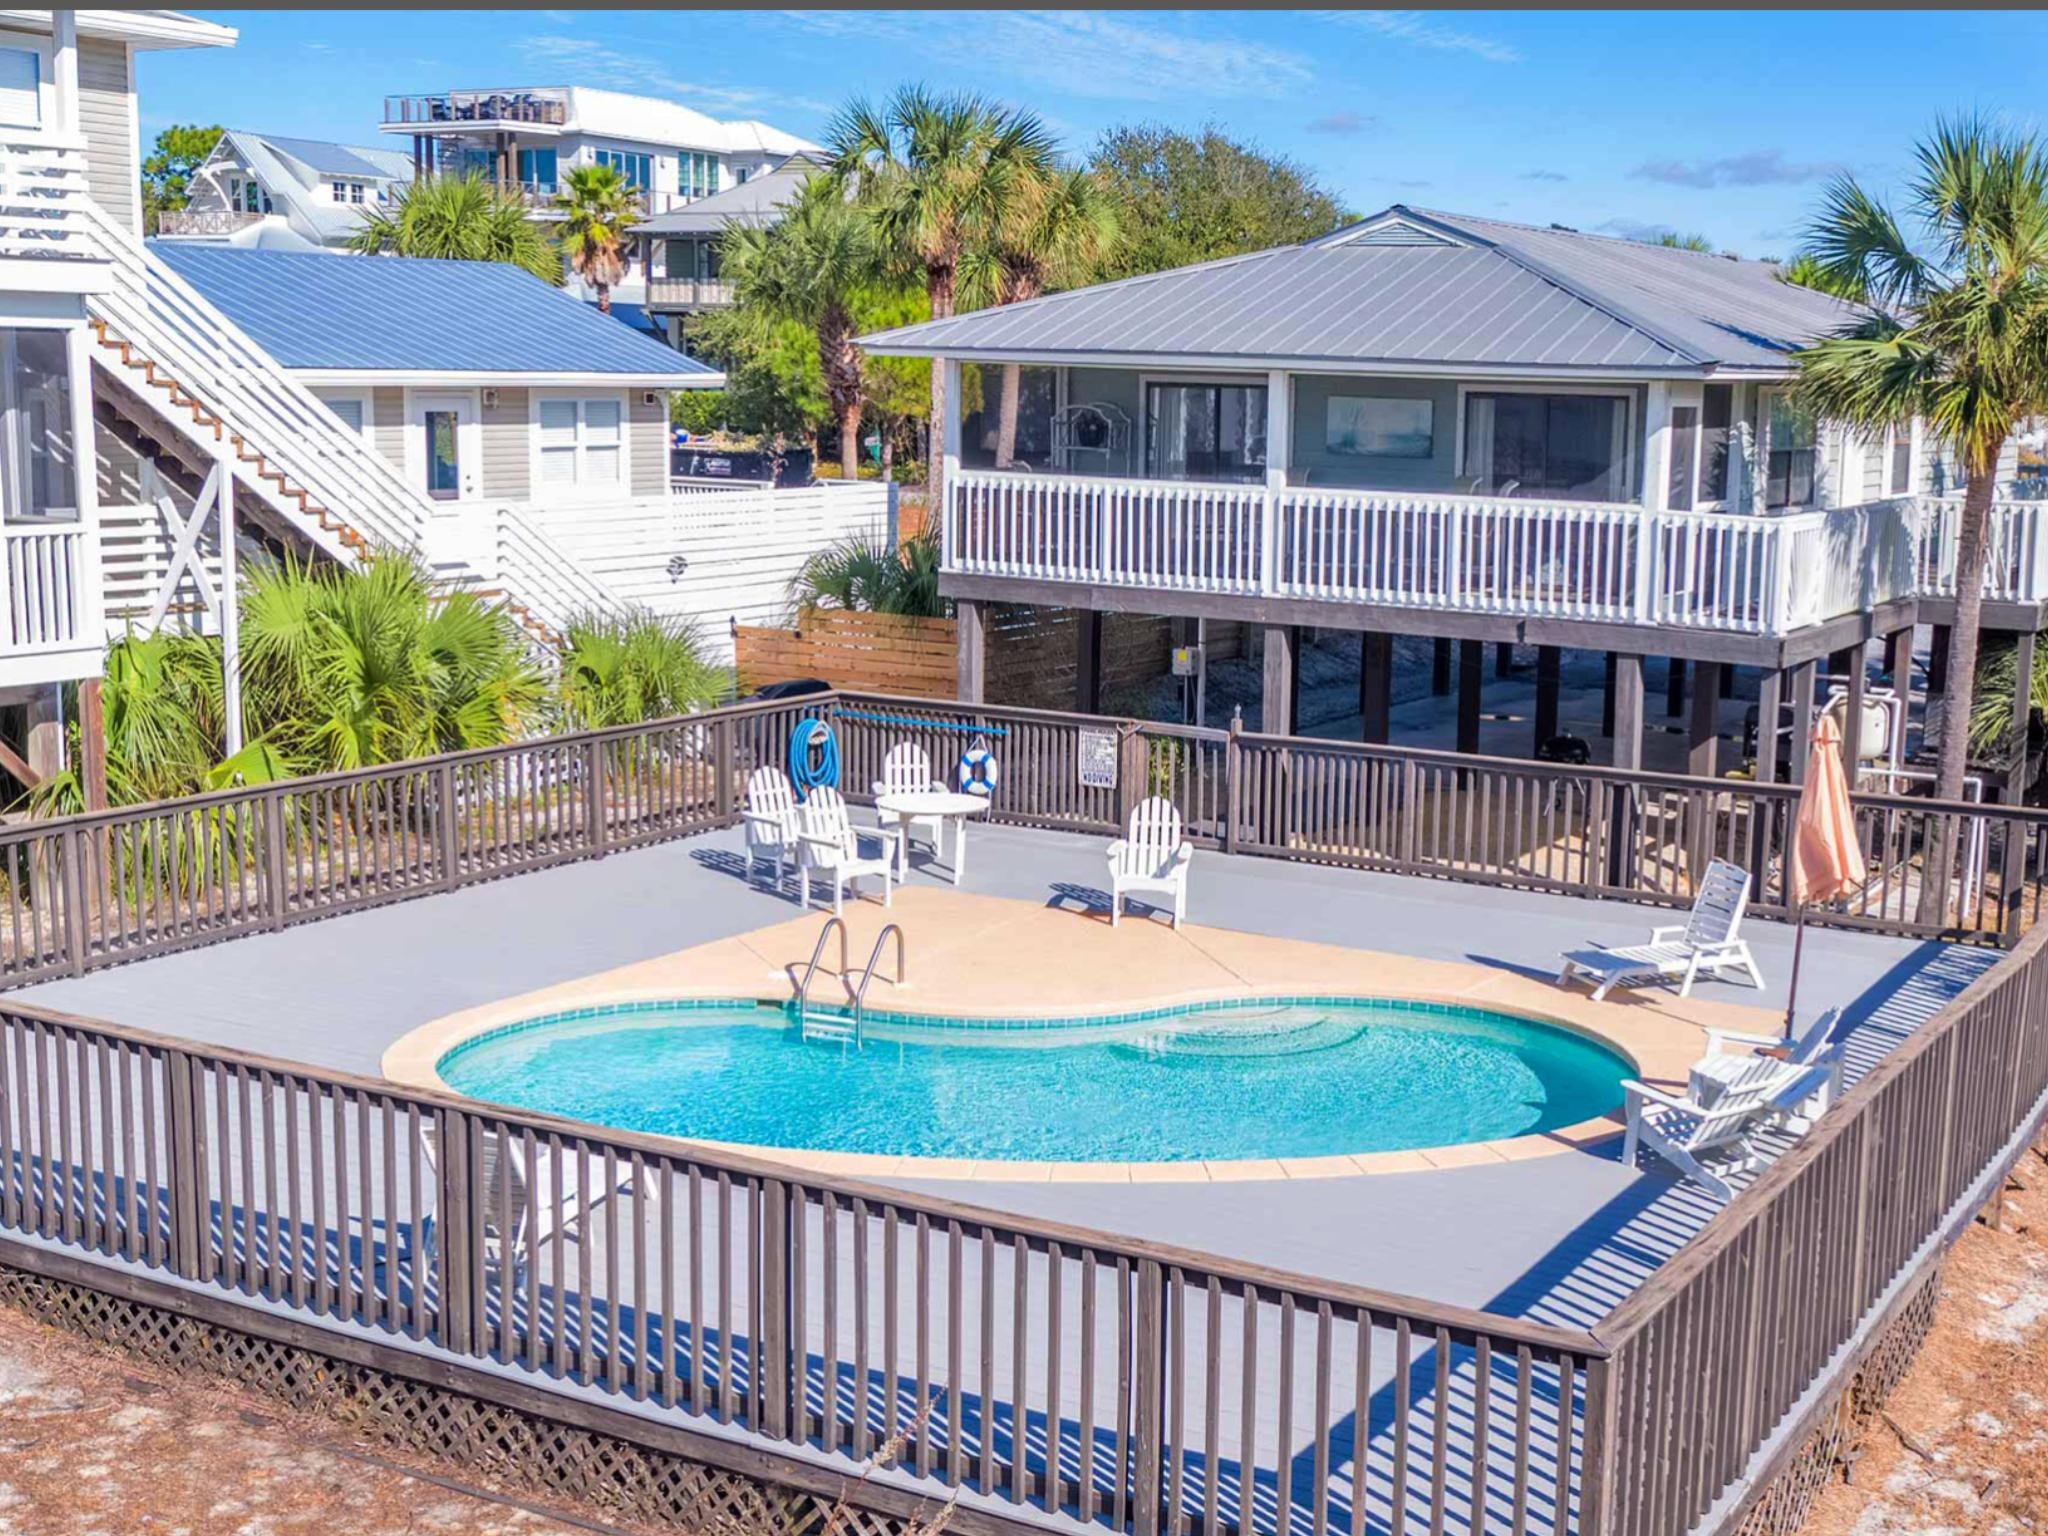 A 3 Bedroom 2 Bedroom Grayton Beach Home